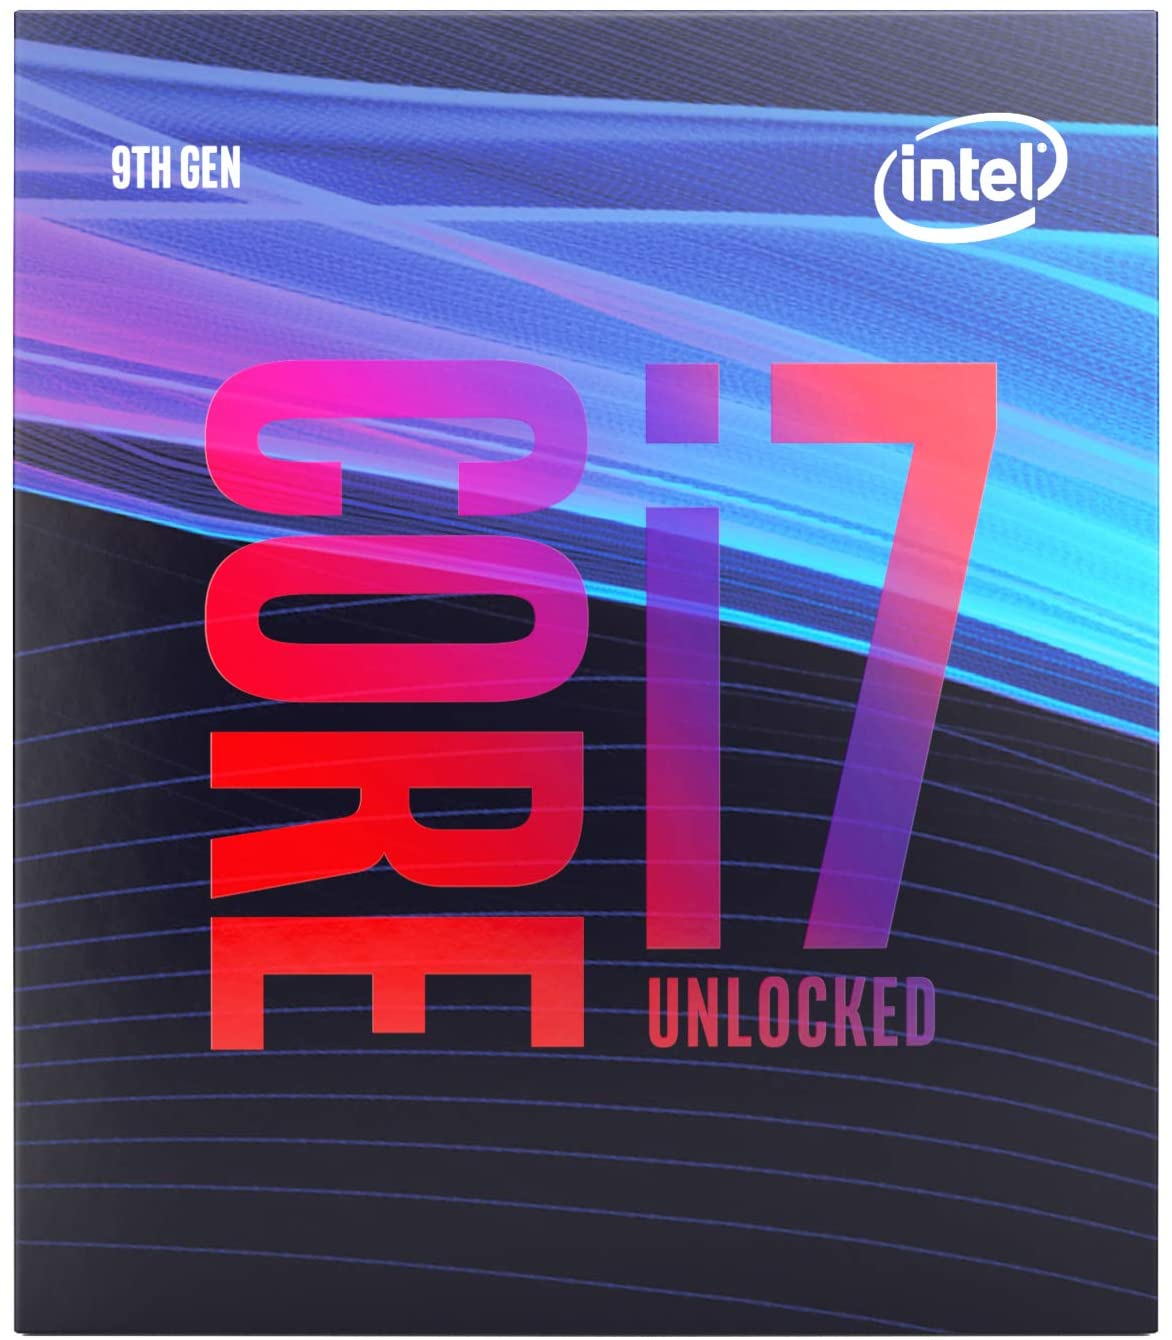 intel core i7 9700k image